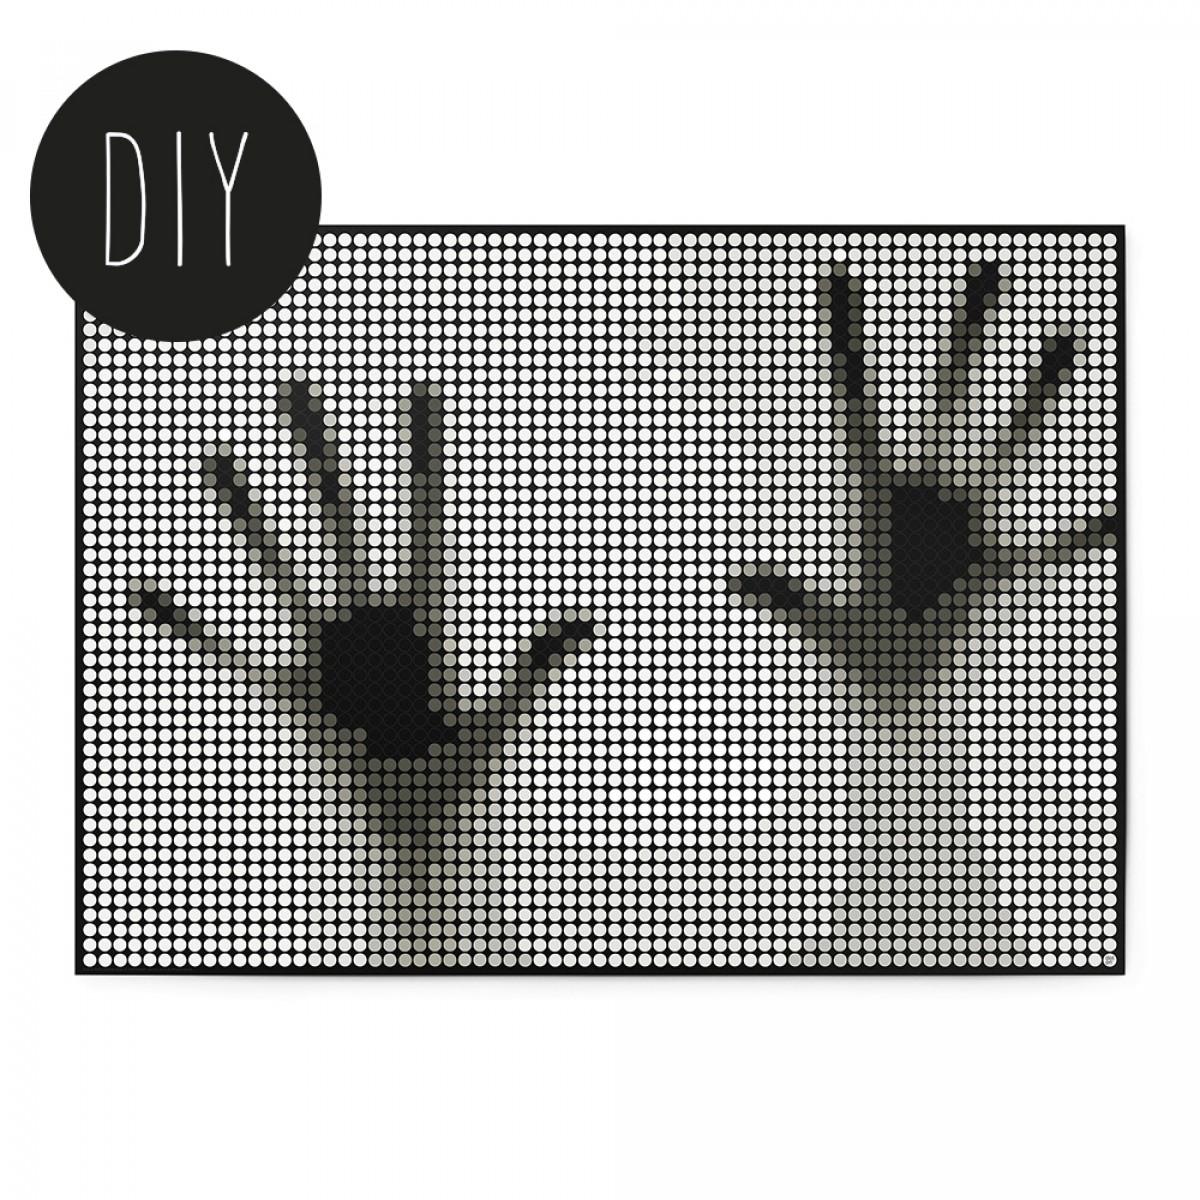 dot on art / hands – DIY-Kunstwerk zum Selberkleben / 50x70 cm